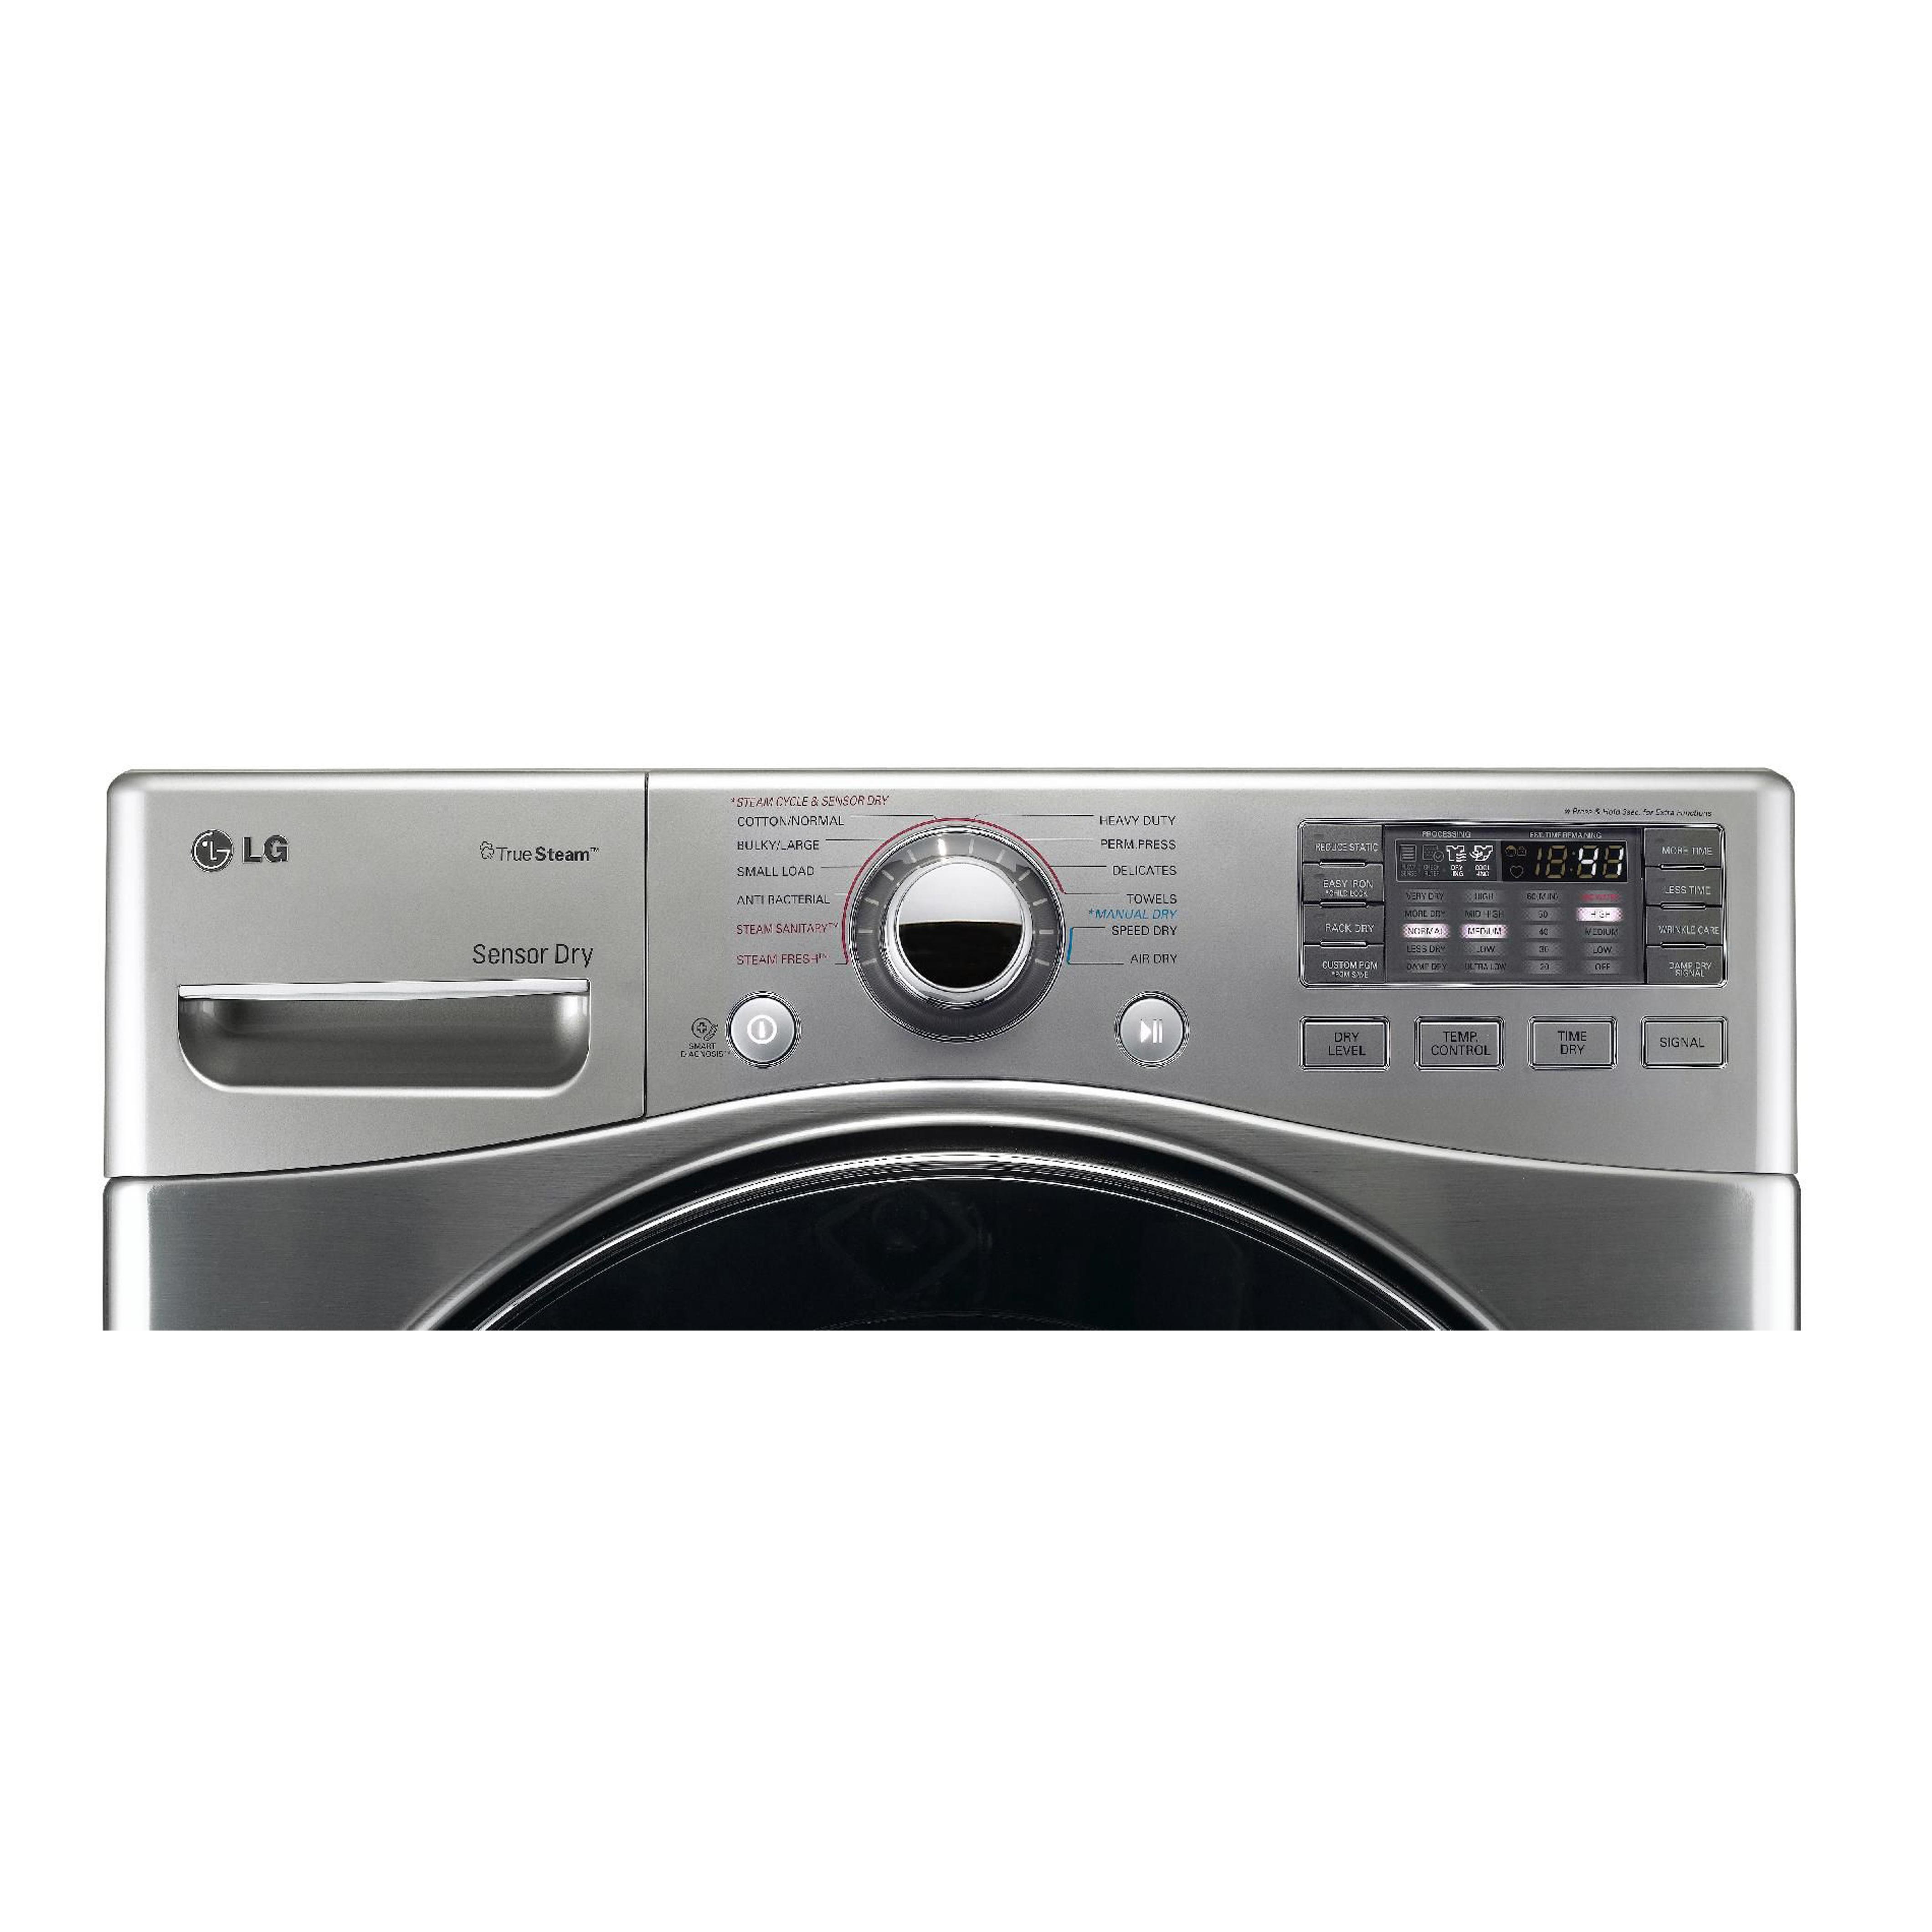 LG 7.3 cu. ft. Steam Gas Dryer w/ Sensor Dry  - Graphite Steel